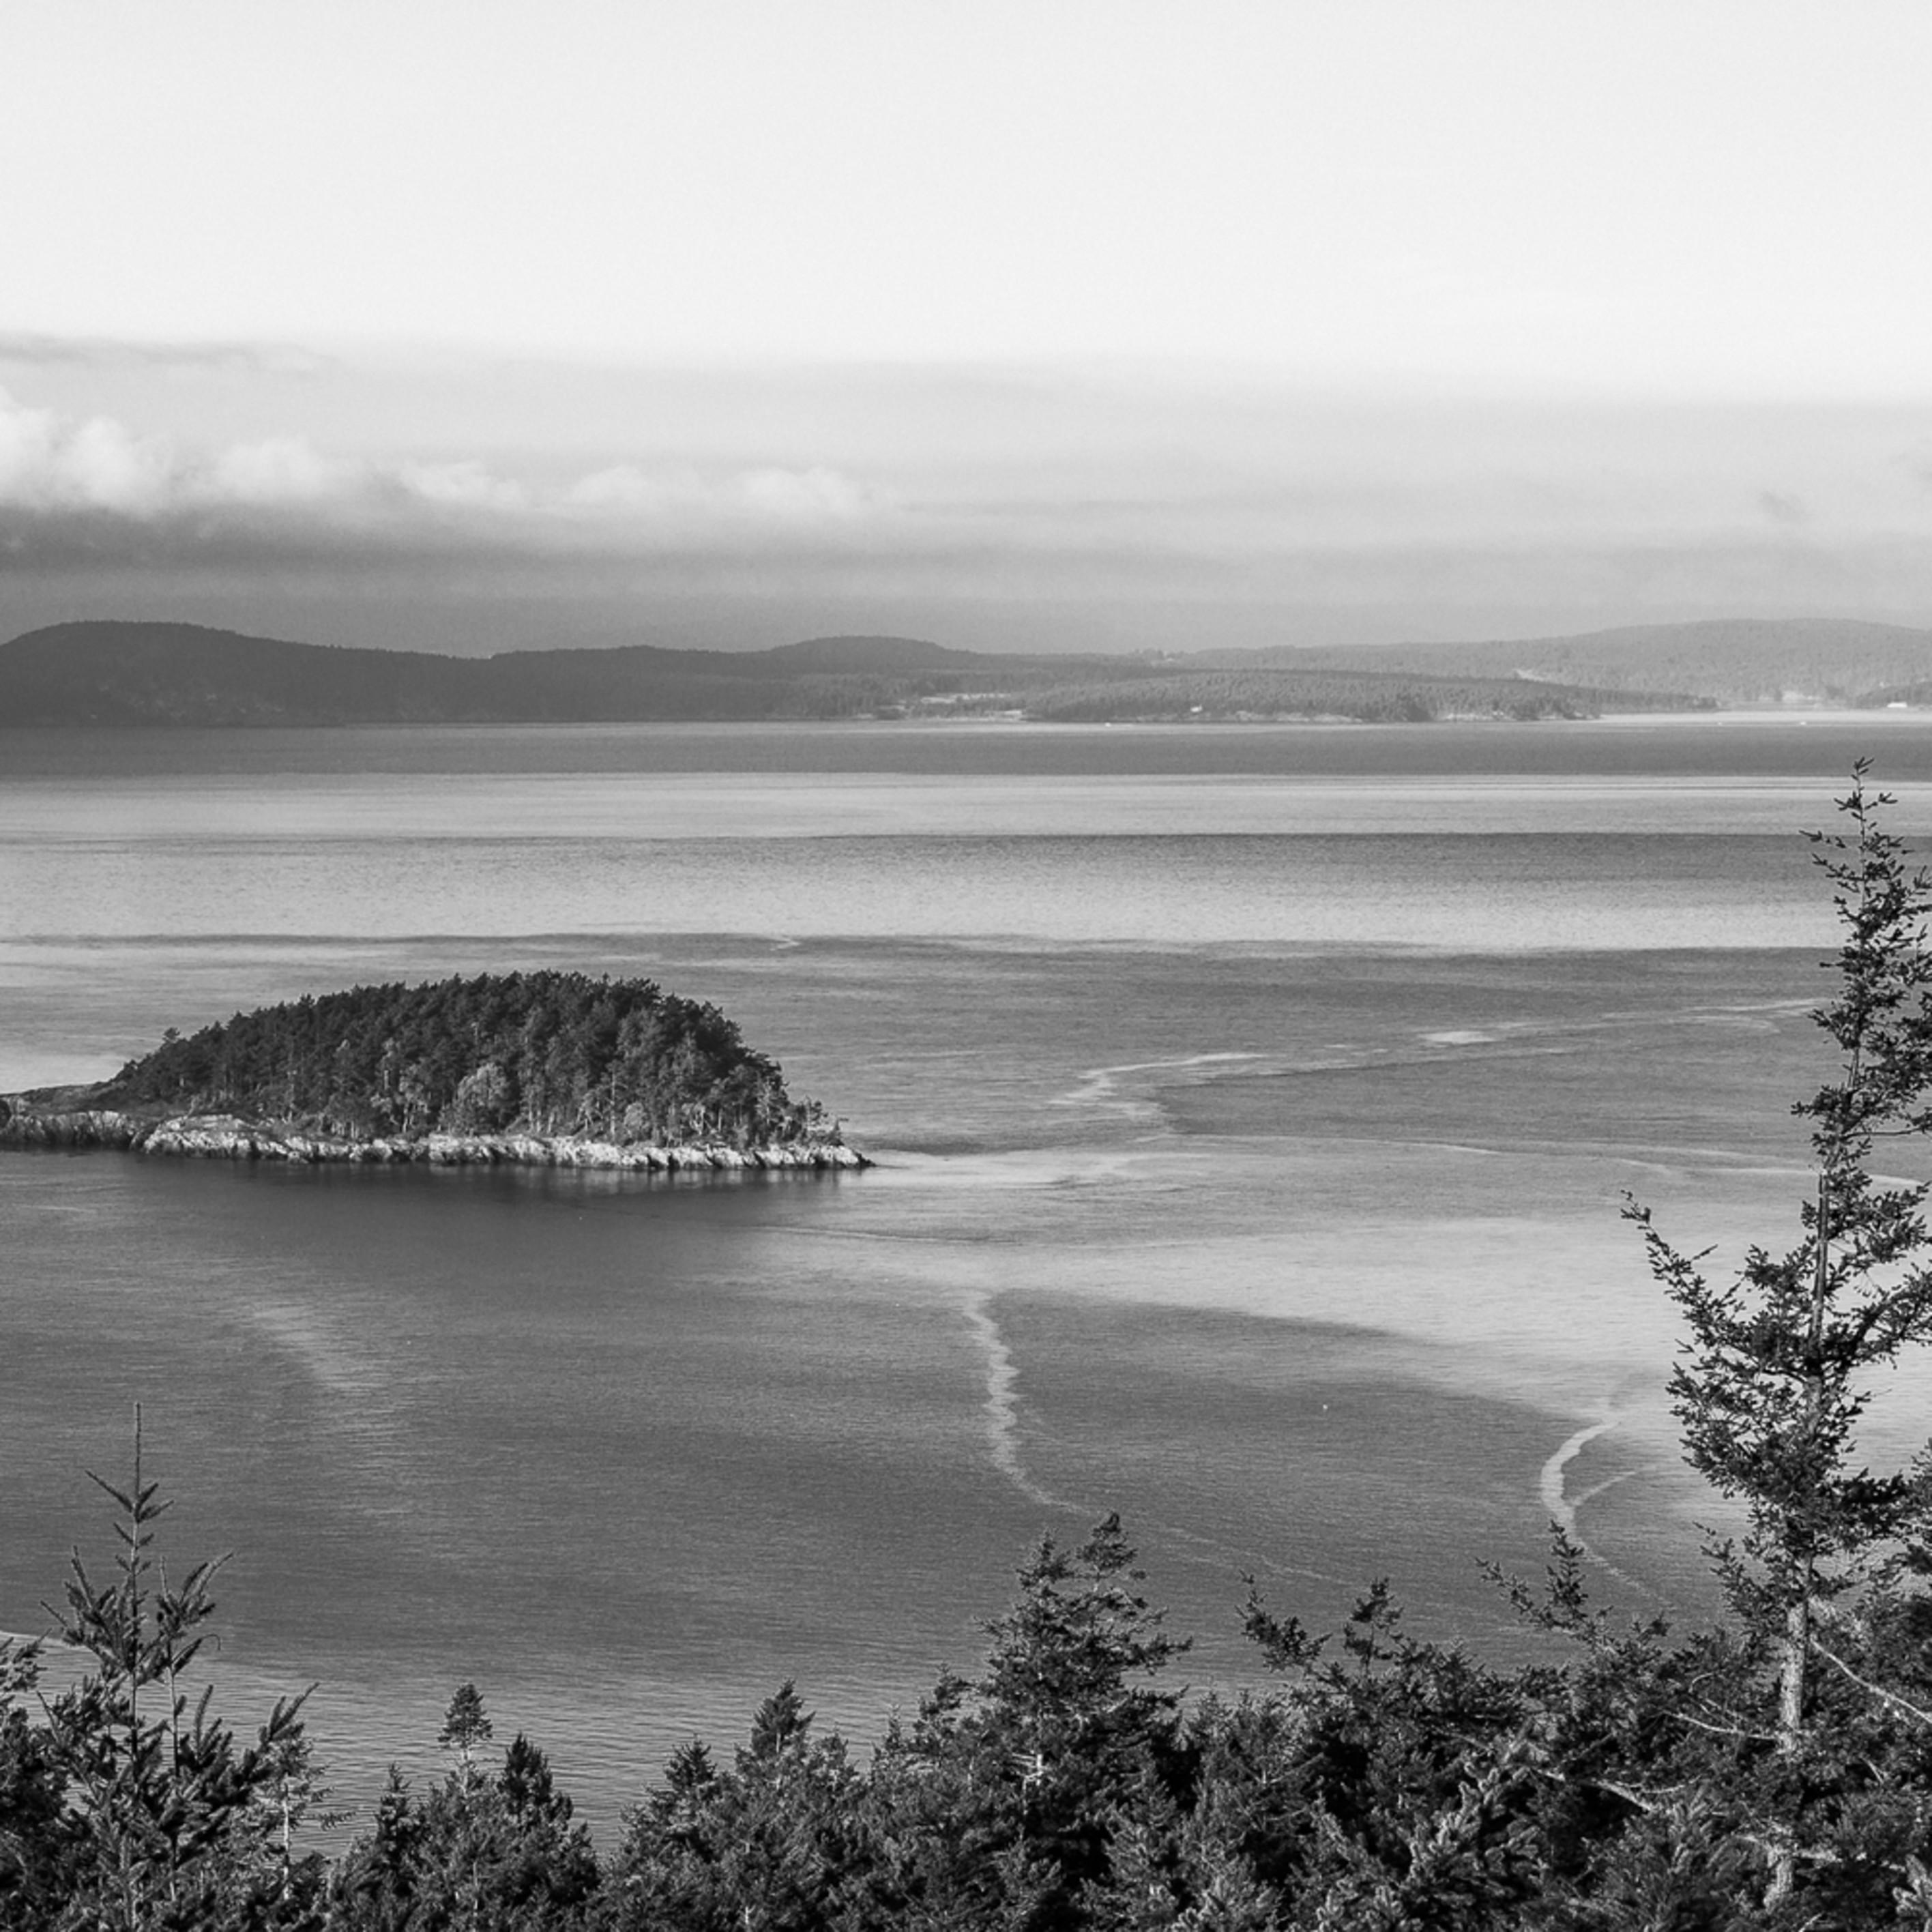 Deception island goose rock summit deception pass state park washington 2016 anp5nw